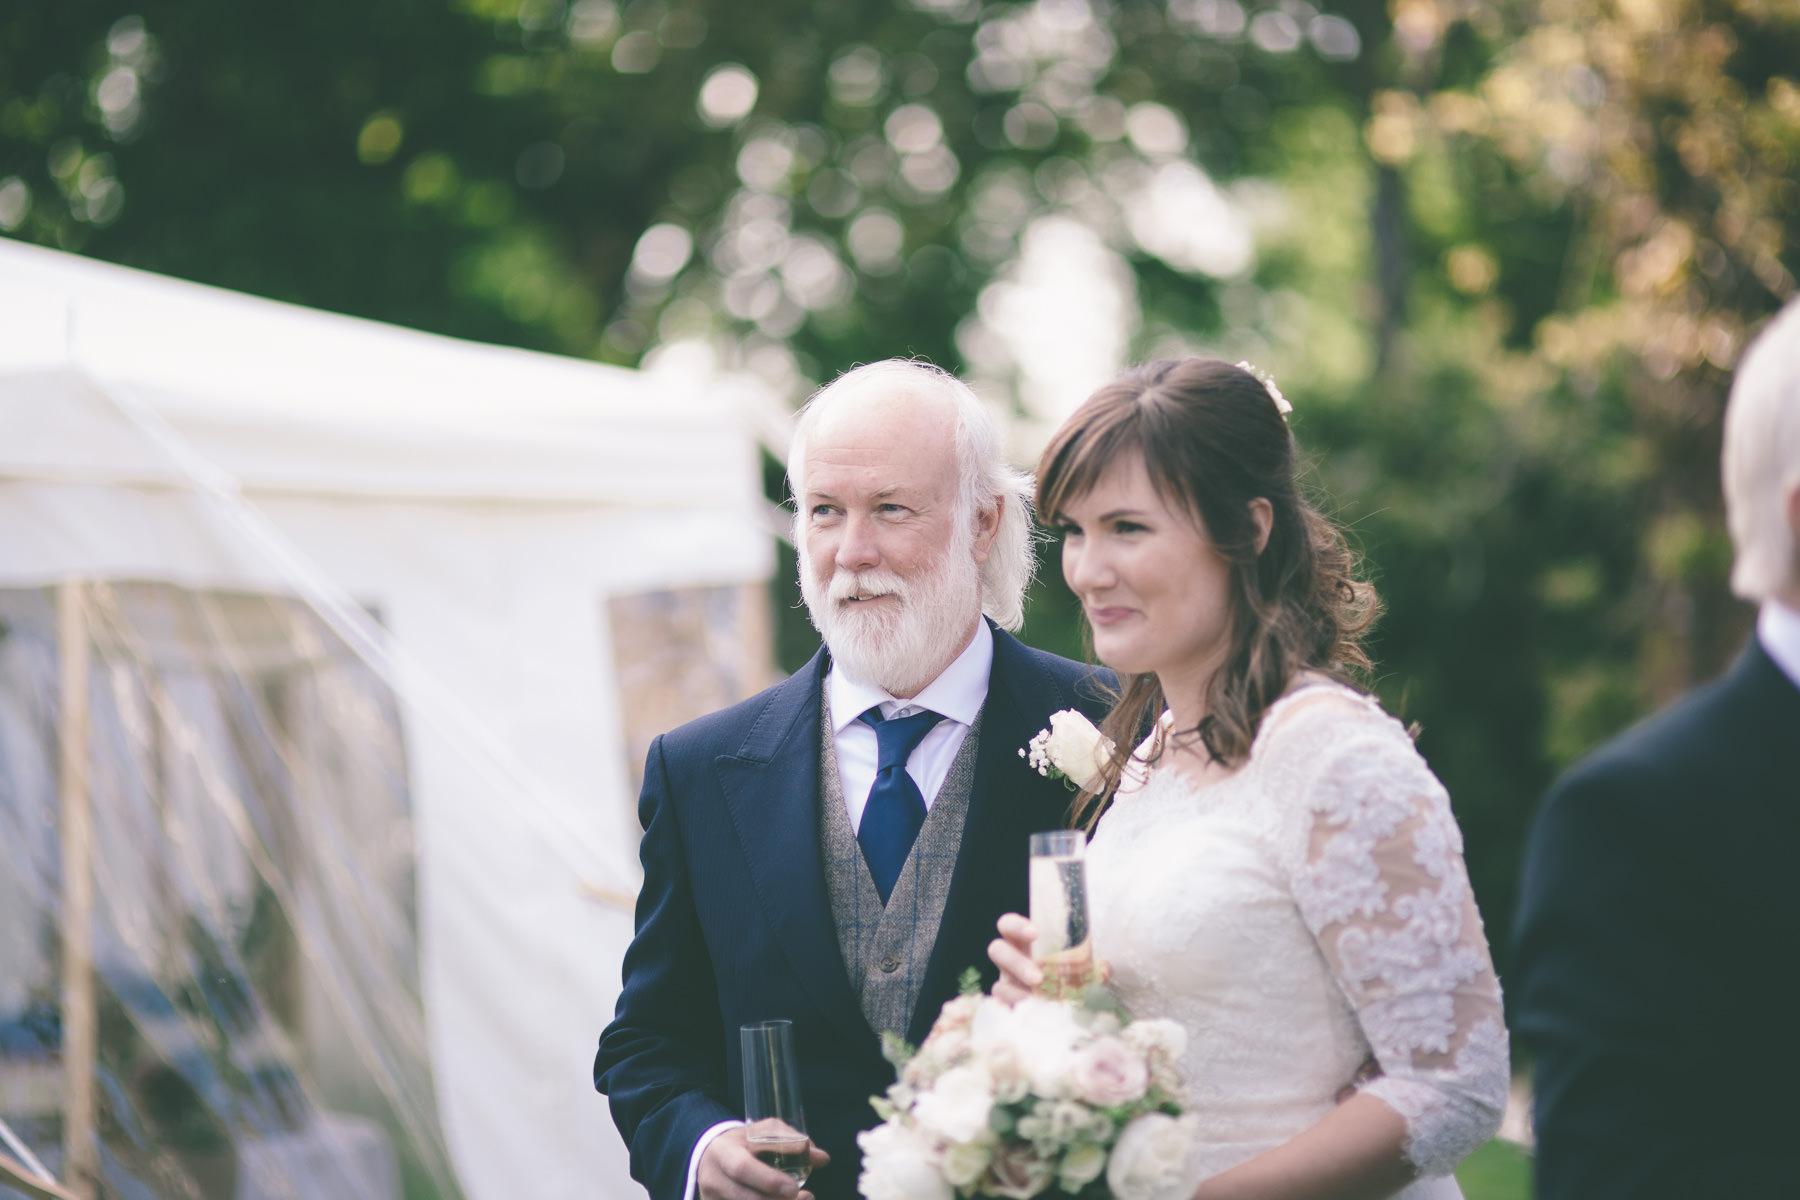 Pamber-Place-wedding-photography-basingstoke-hampshire-175